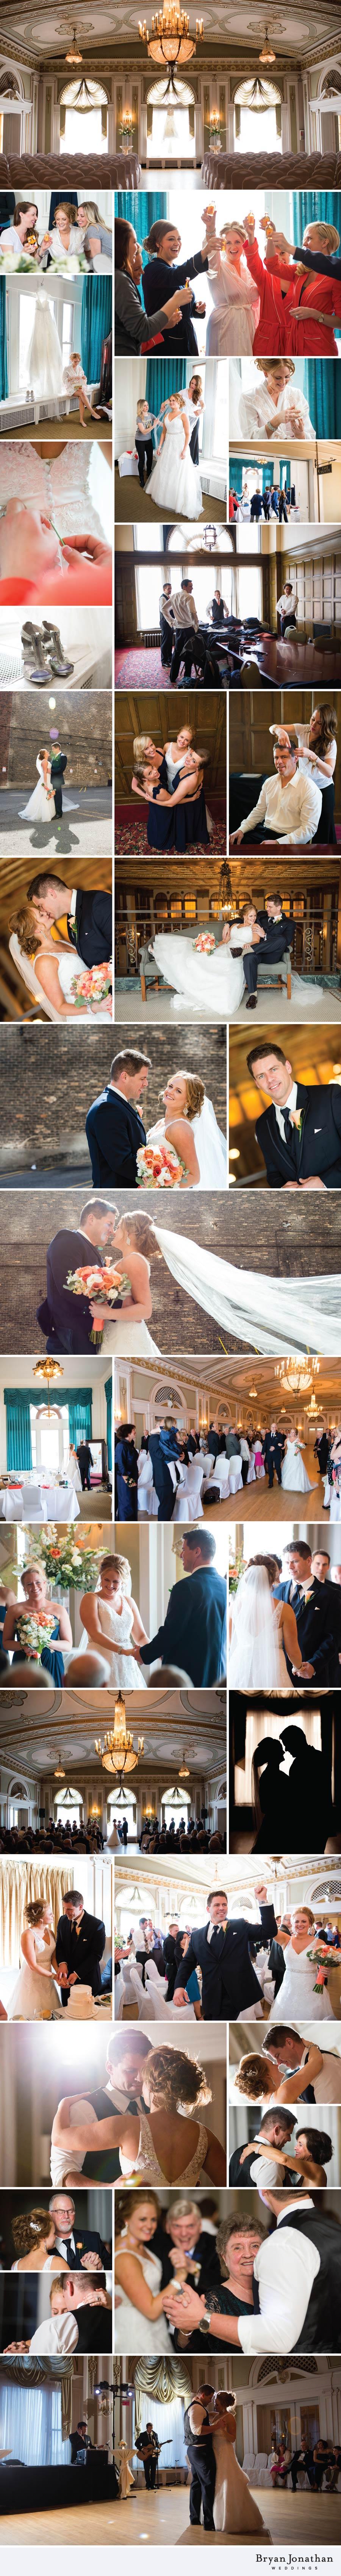 wedding-photography-at-greysolon-ballroom-by-blackwoods-bryan-jonathan-weddings